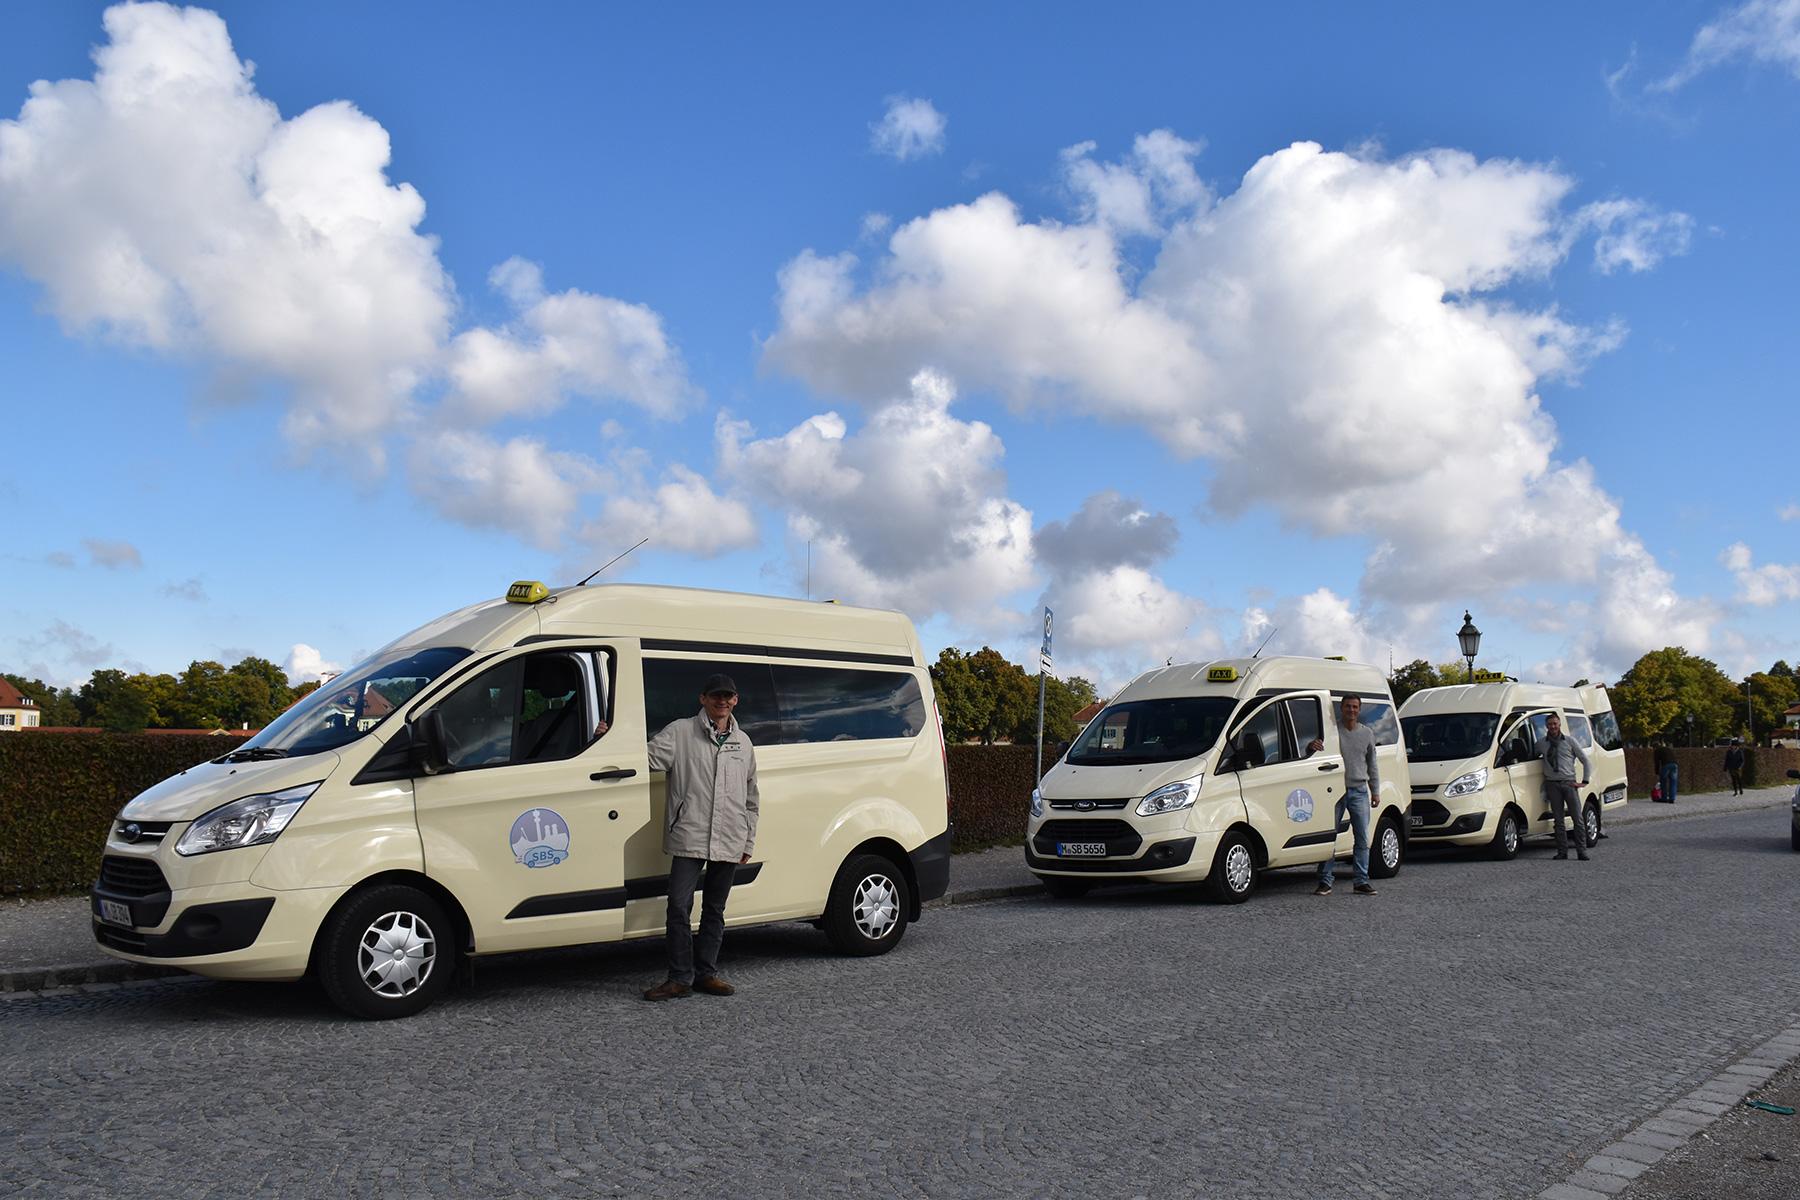 Drei Taxis der Firma SBS München